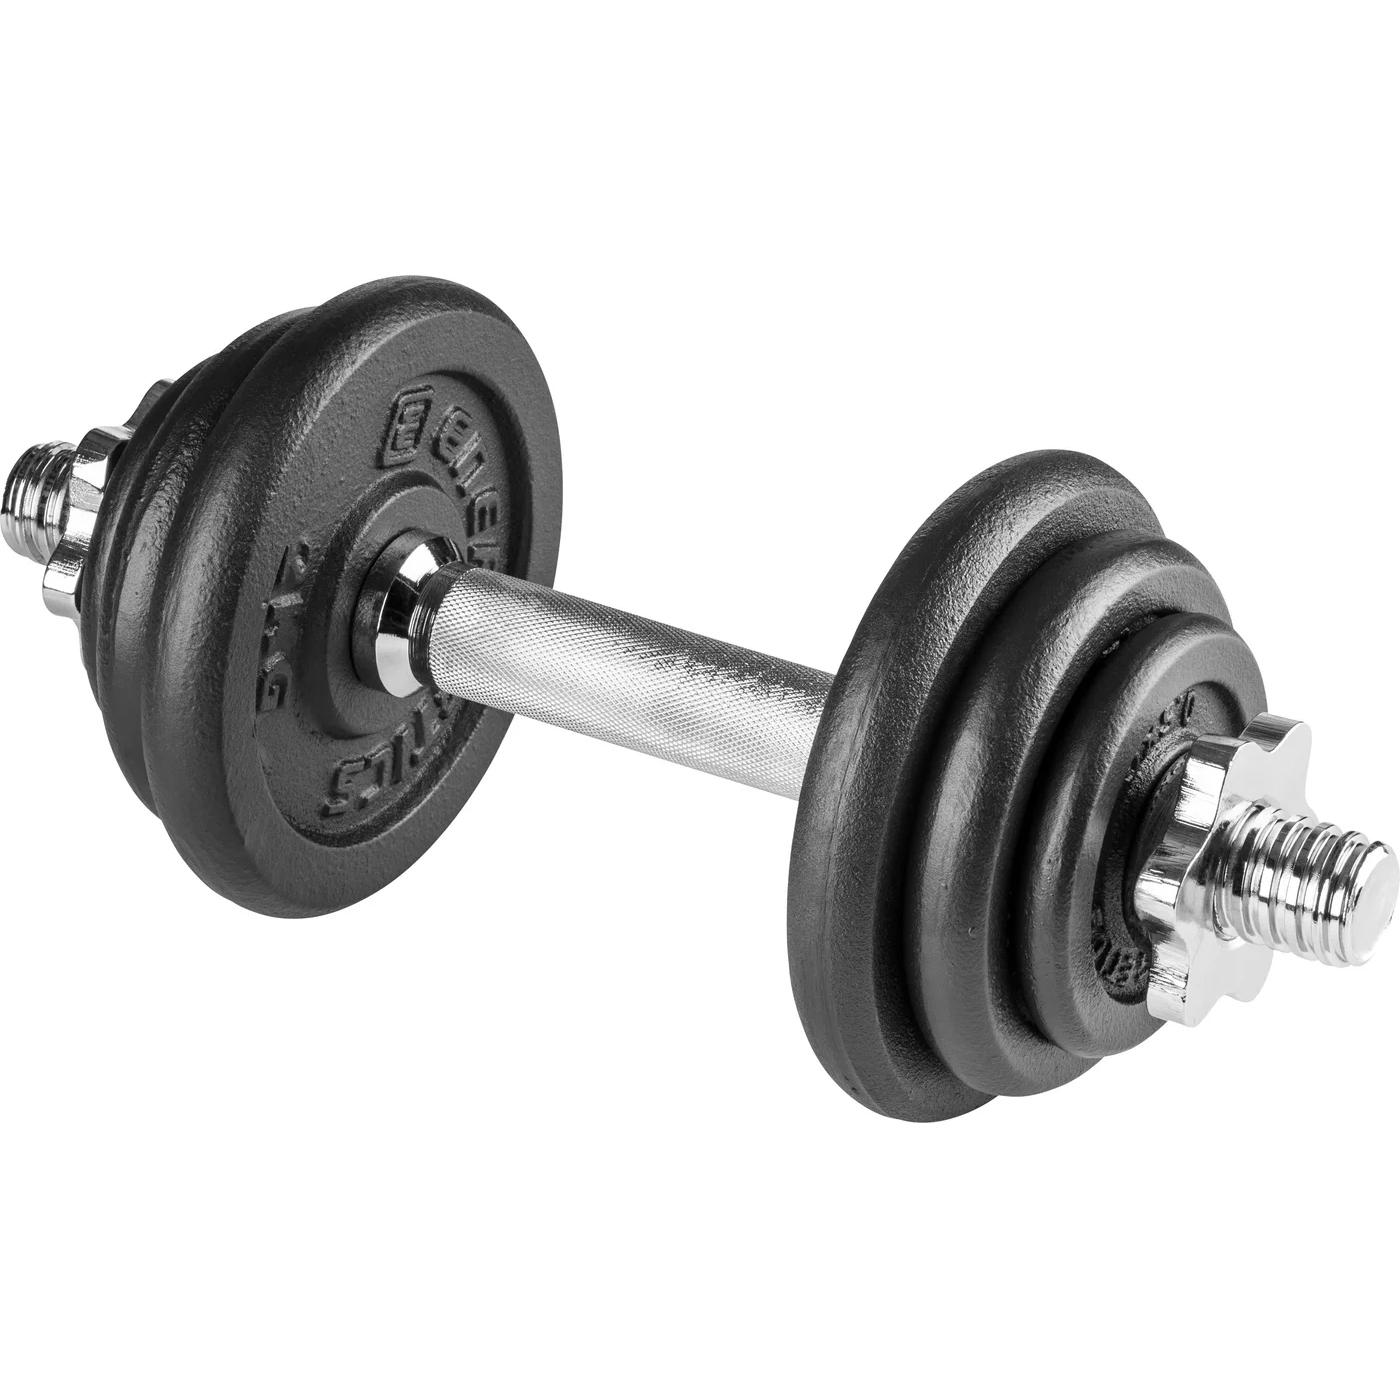 ENERGETICS Dumbbell Set 10kg CI - black/black